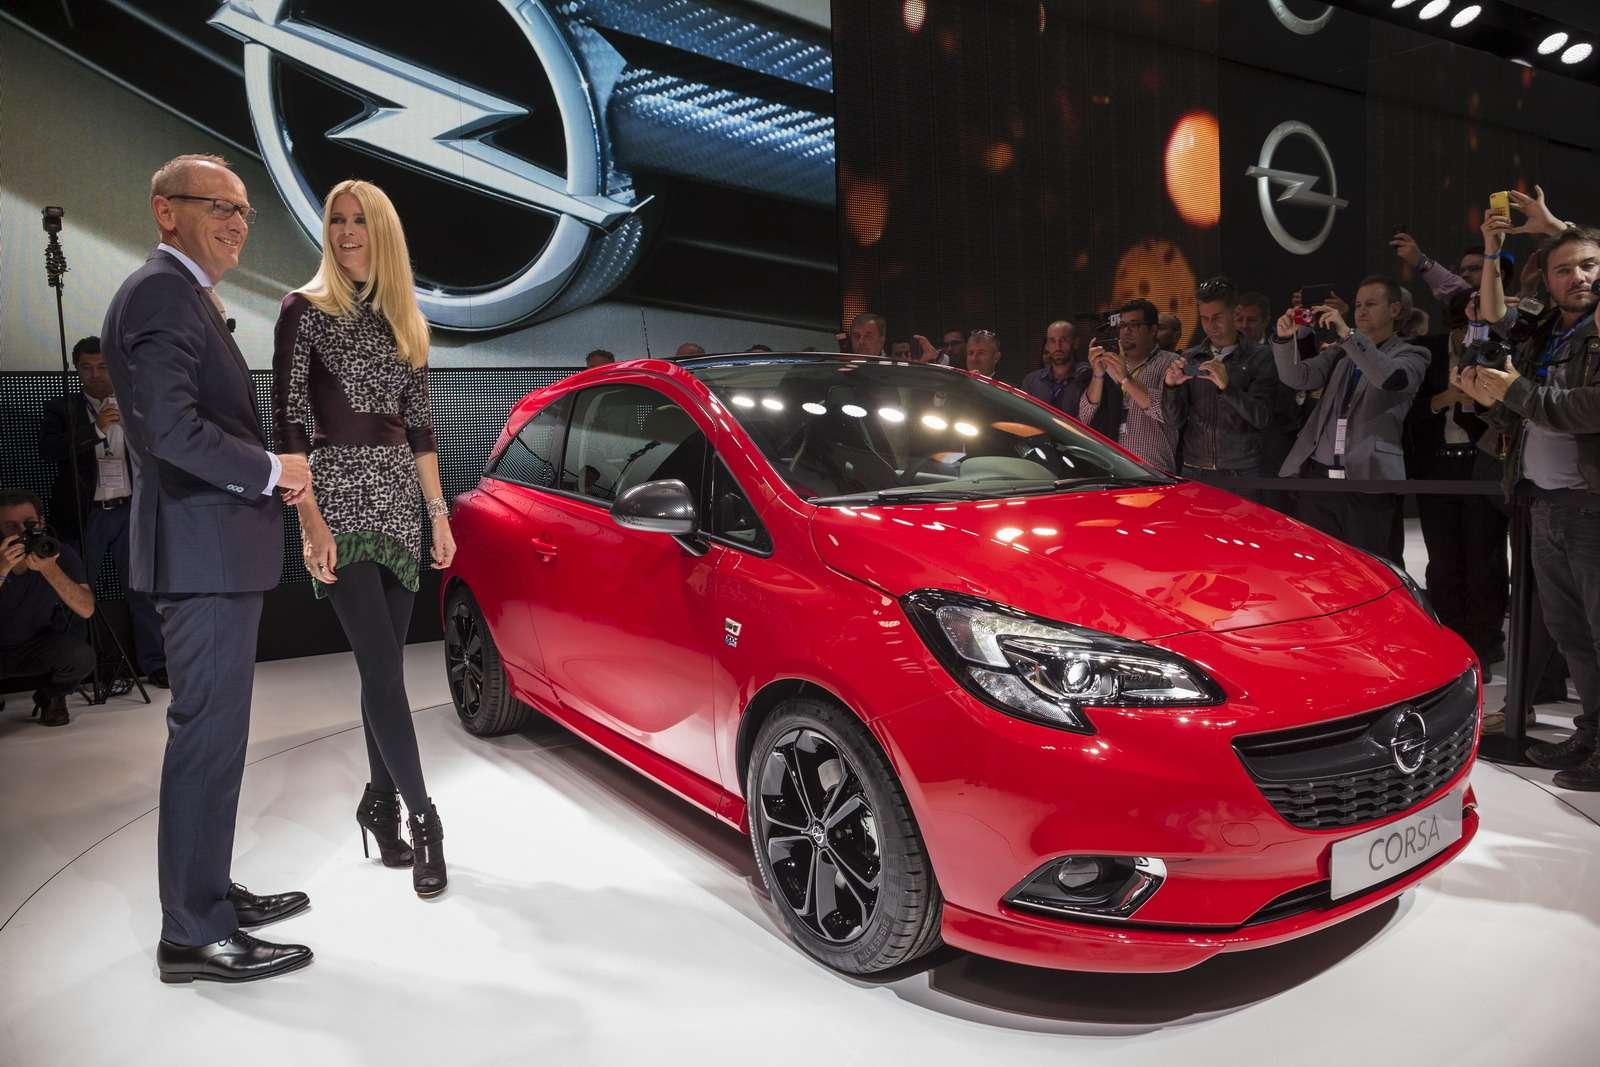 2014-Paris-Opel-Press-Conference-291748_новый размер